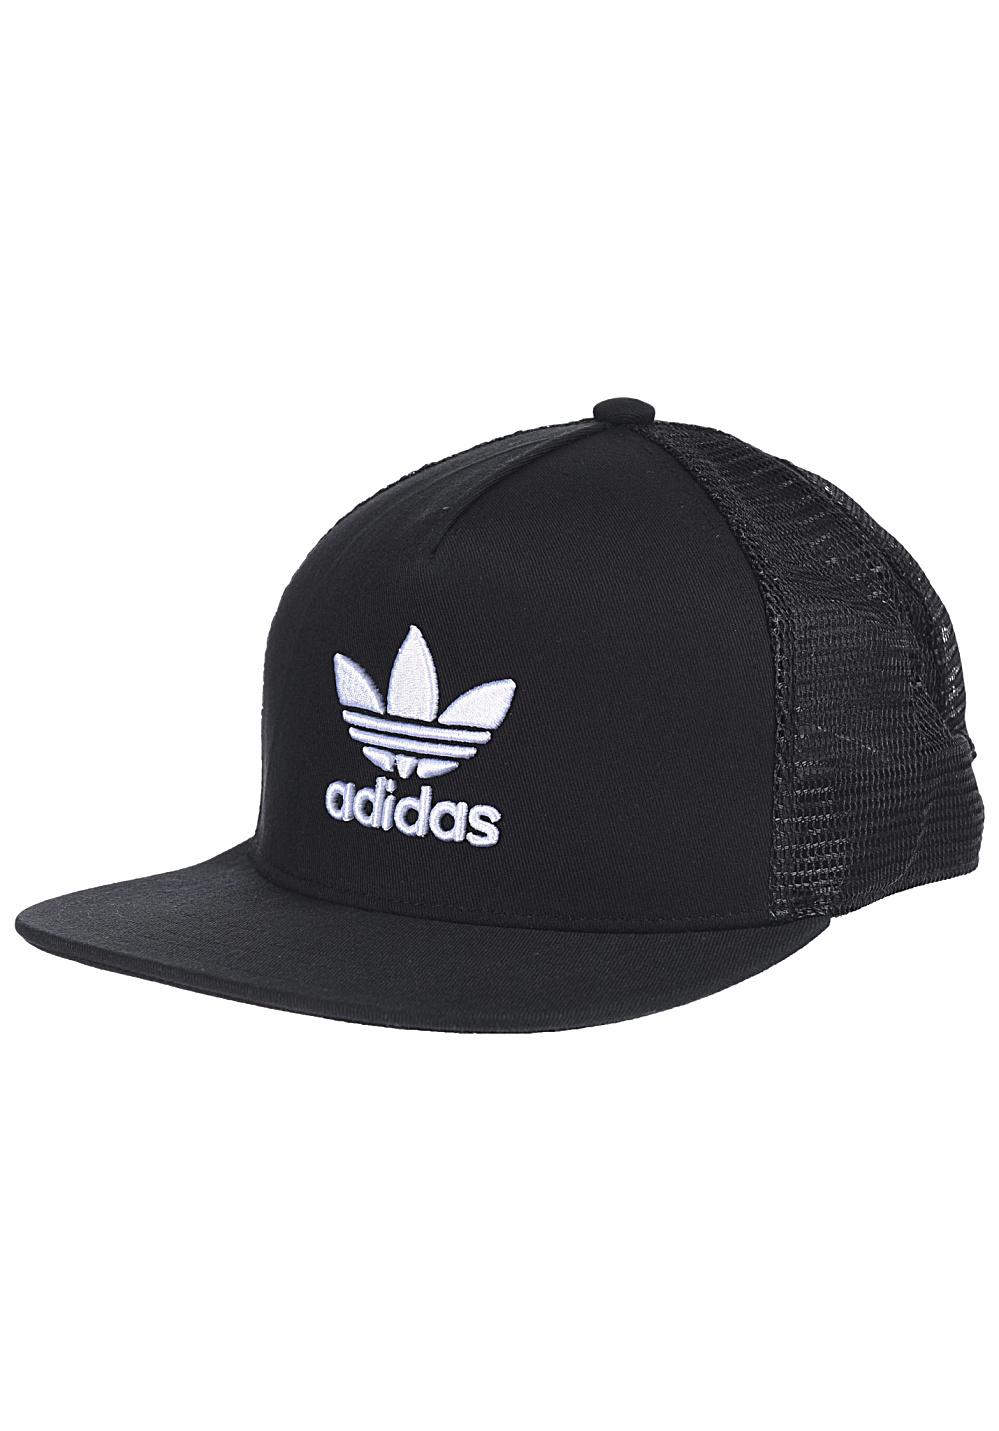 adidas-trefoil-casquette-trucker-noirs